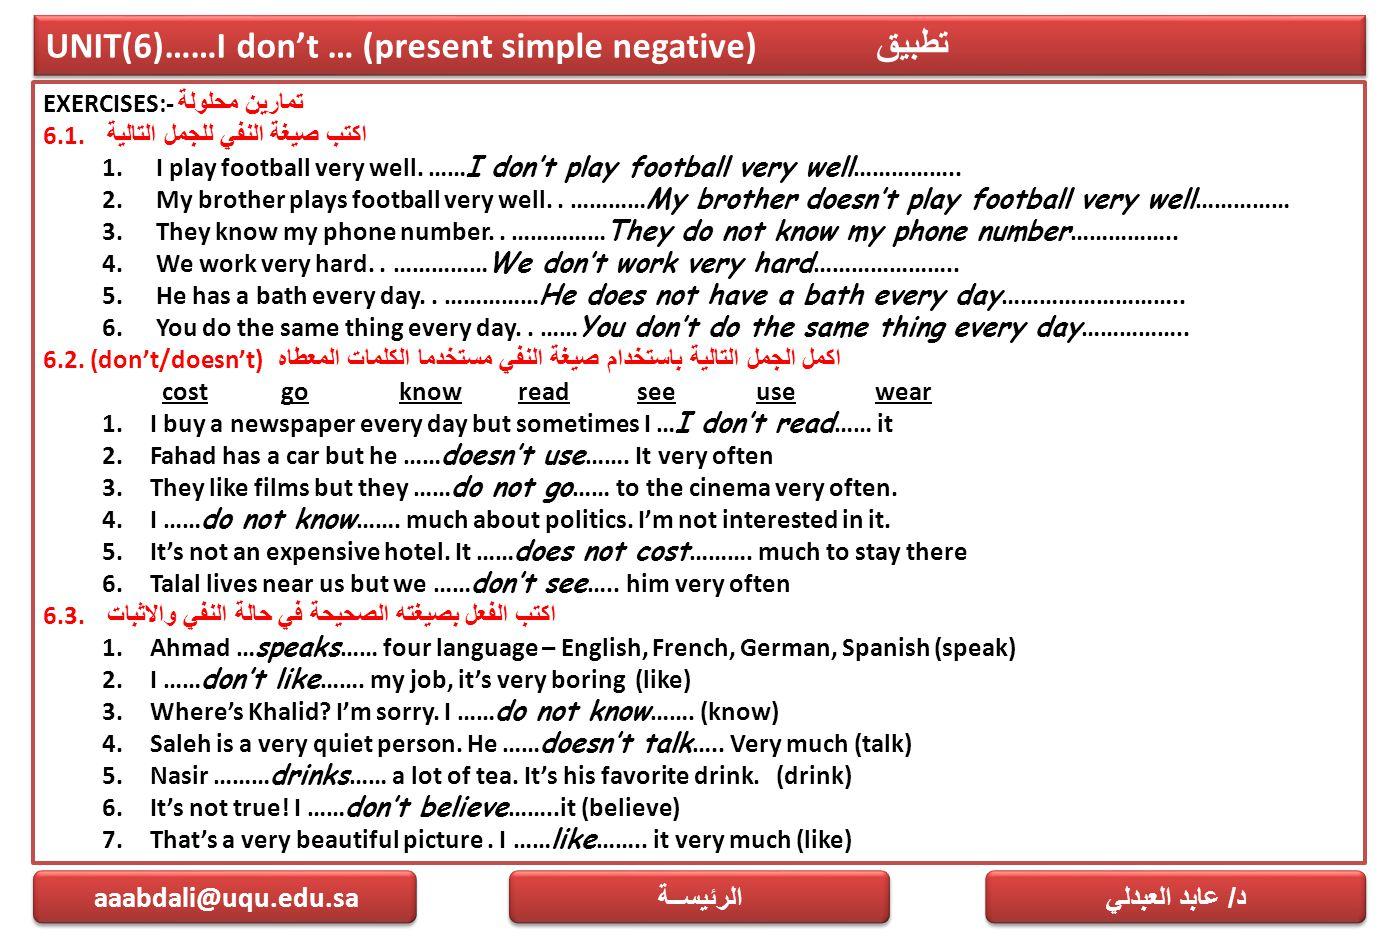 UNIT(6)……I don't … (present simple negative) تطبيق